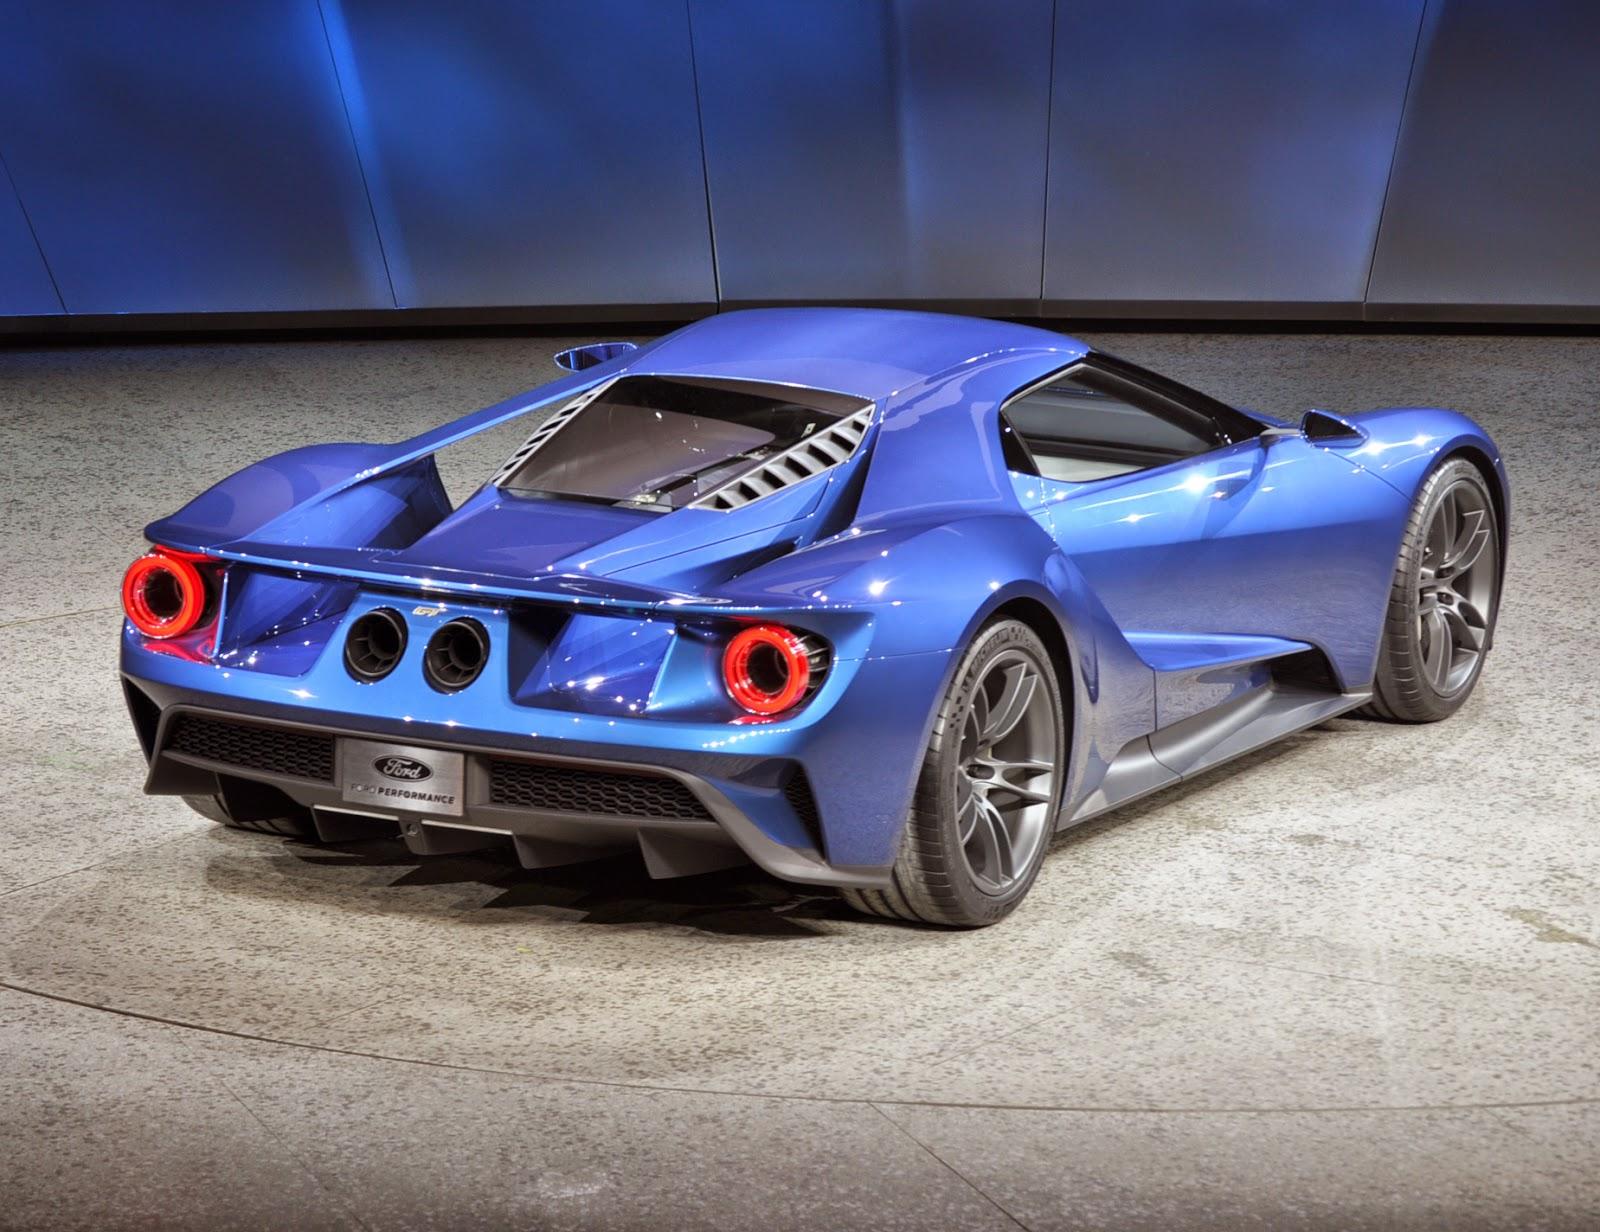 Industrial Design In Victoria Australia: Ford GT Supercar